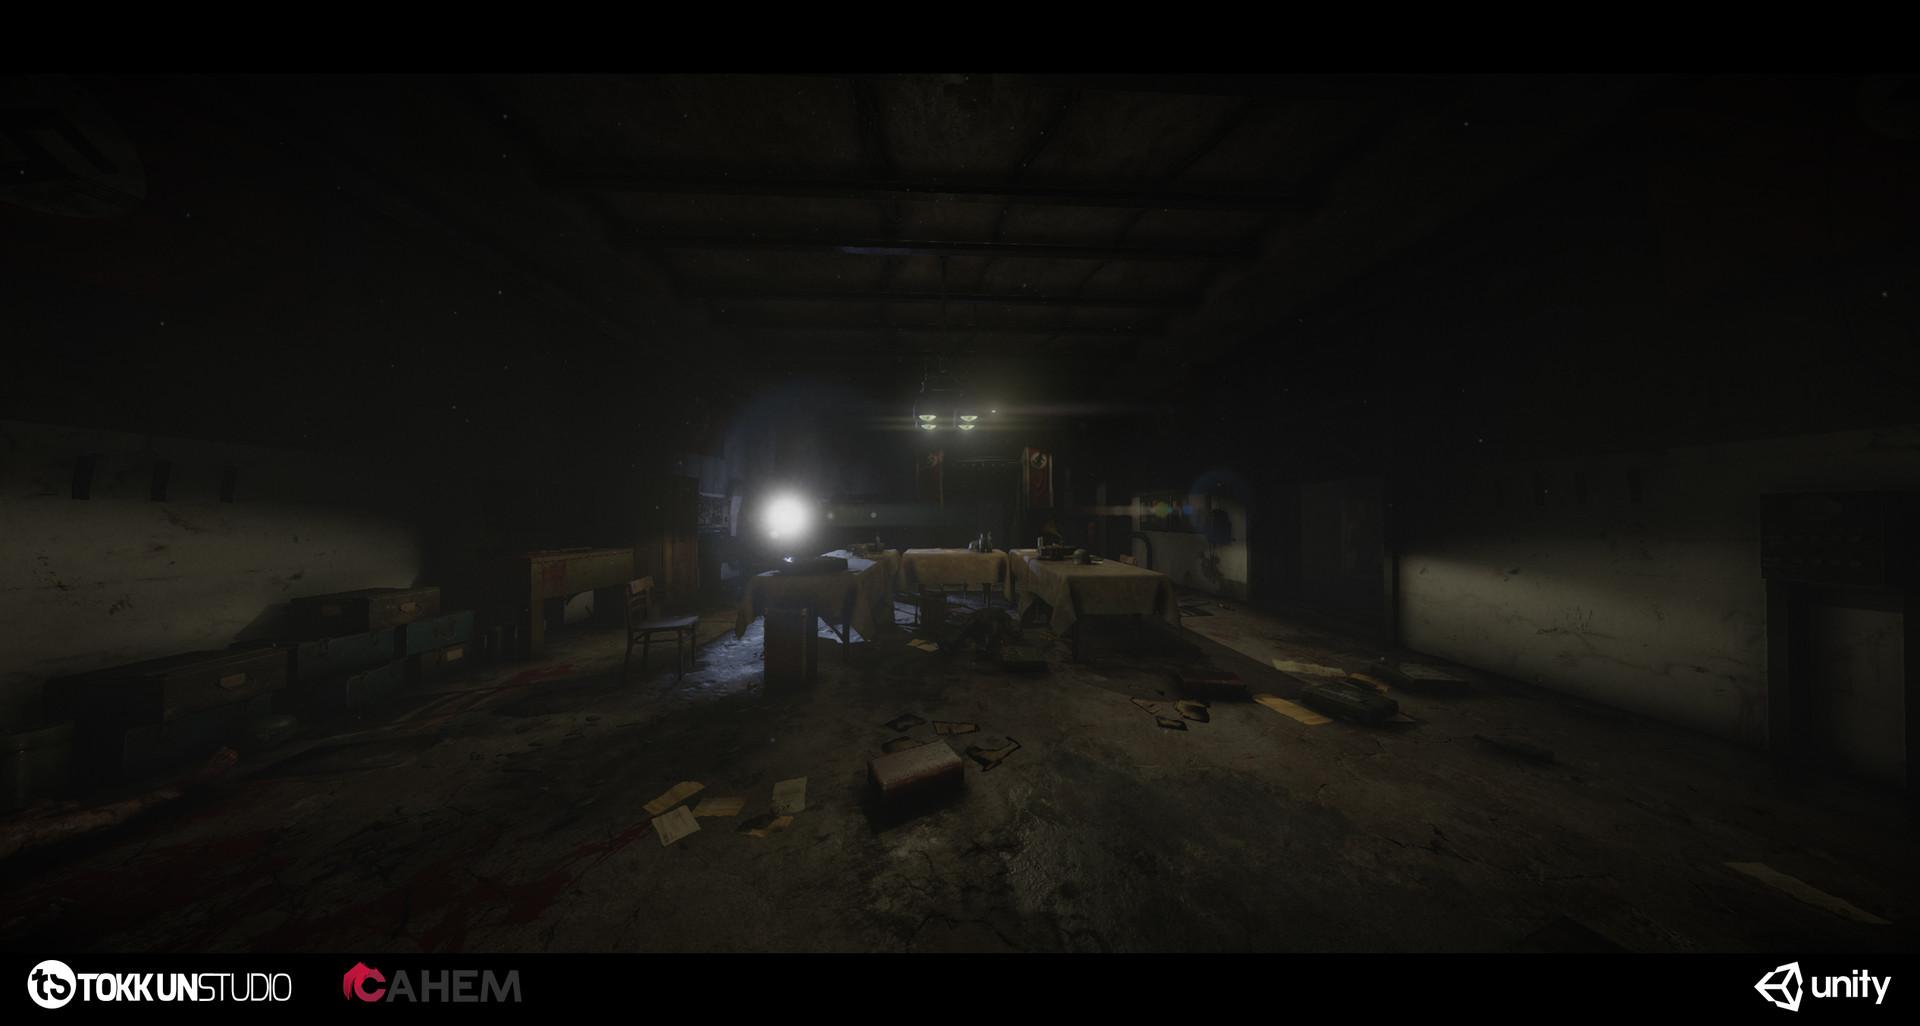 Tokkun studio bunker shot 44